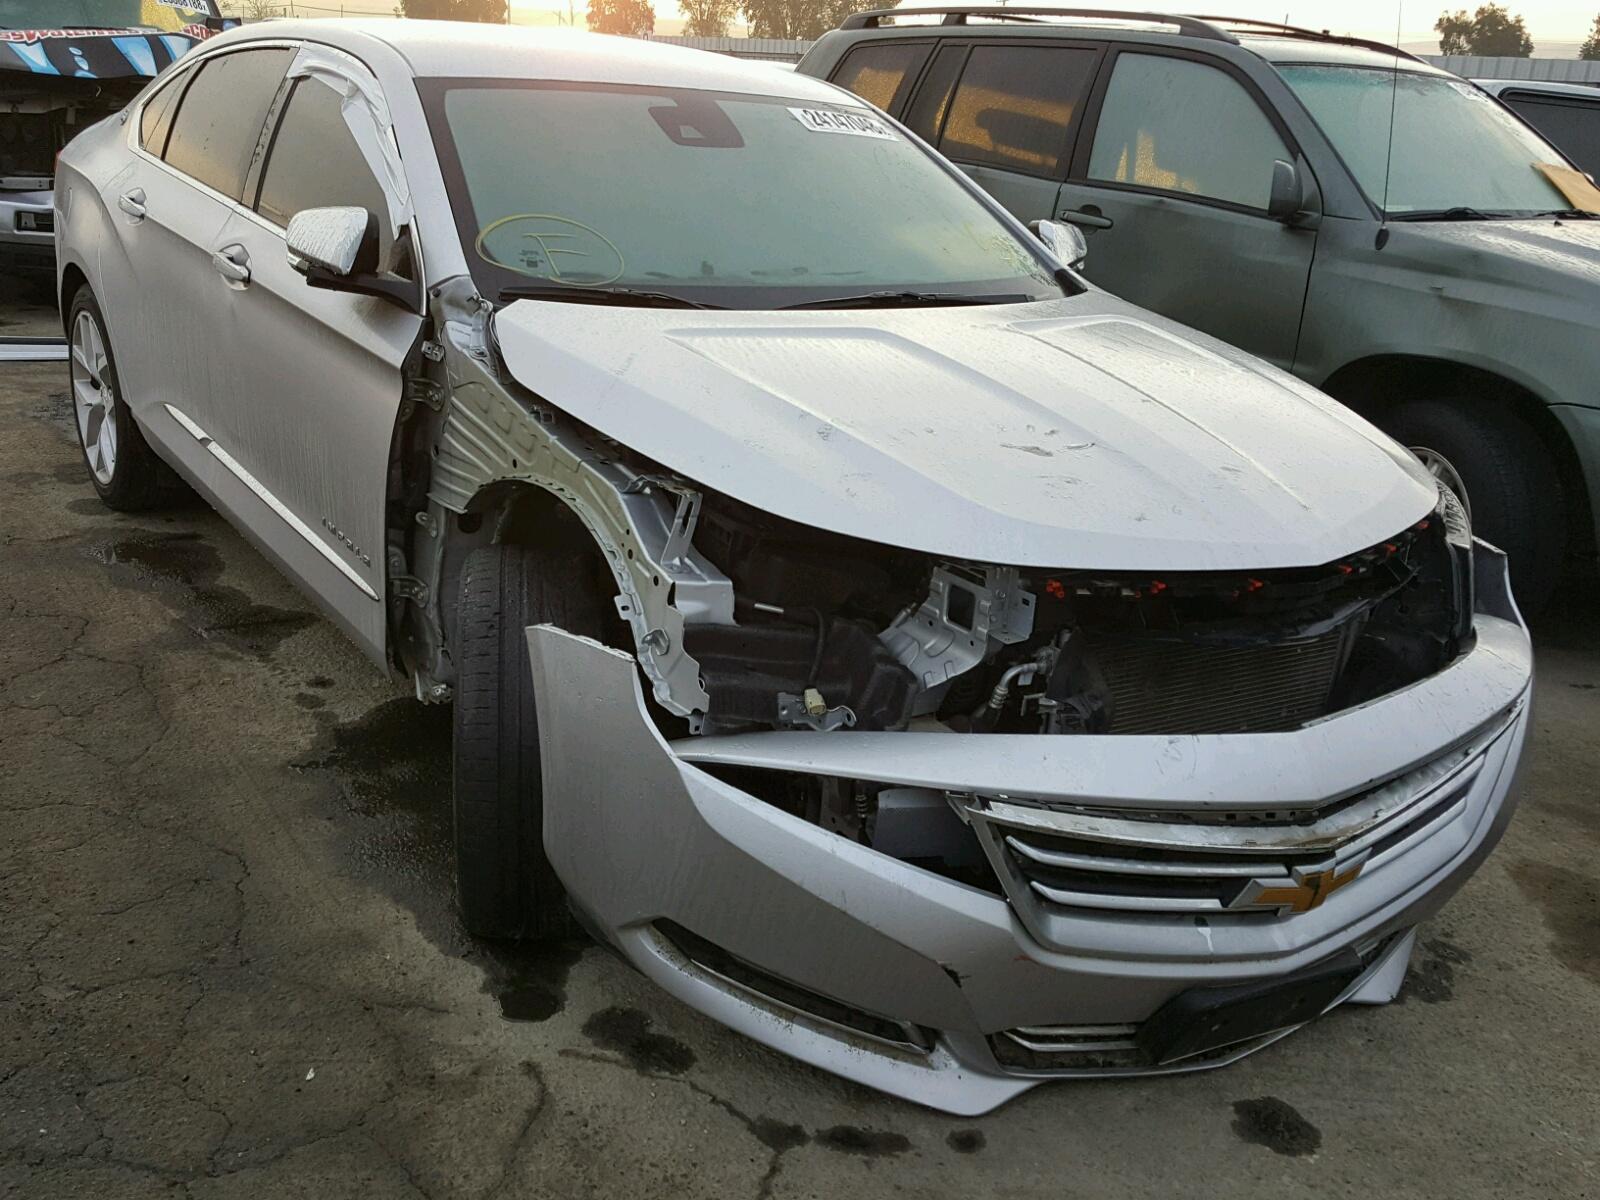 youtube exterior ltz auto ottawa impala watch and chevrolet walkaround gatineau interior show